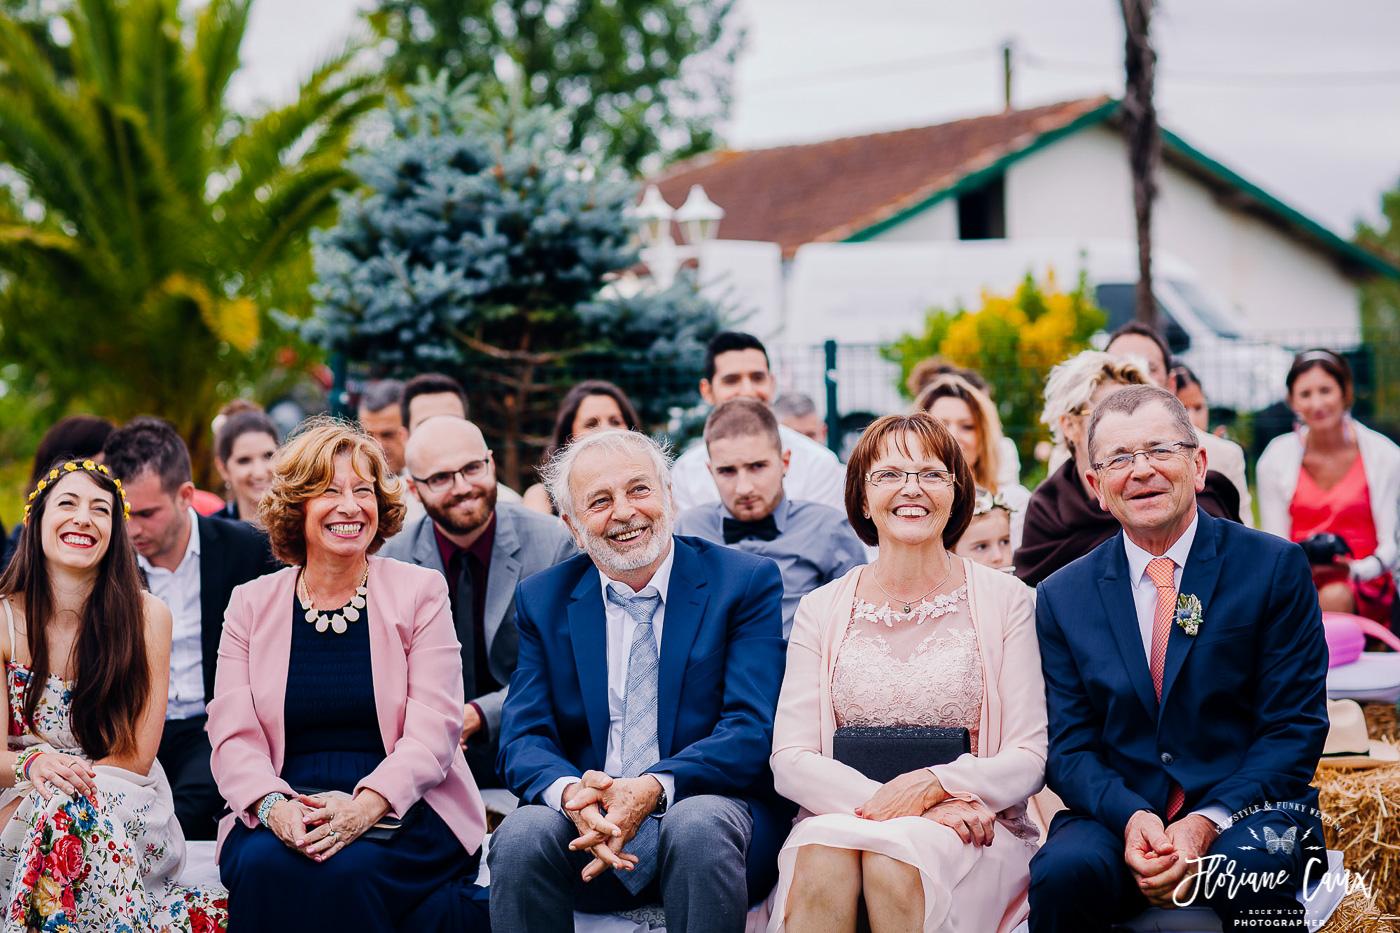 photographe-mariage-pays-basque-Floriane-Caux (29)